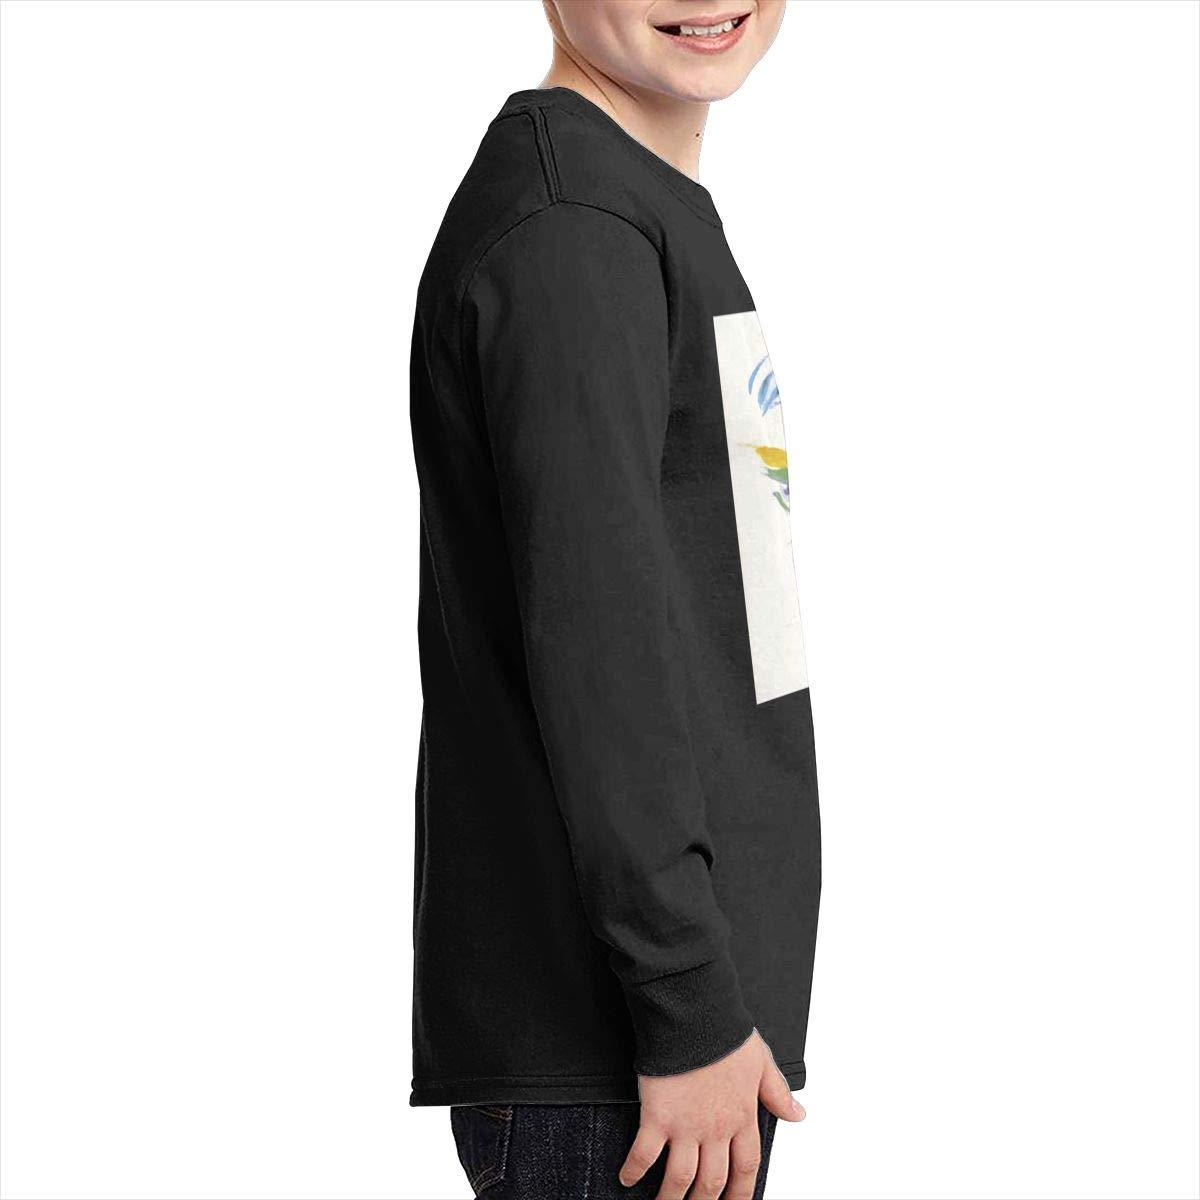 RhteGui The J.Geils Band Boys /& Girls Junior Vintage Long Sleeve T-Shirt Black